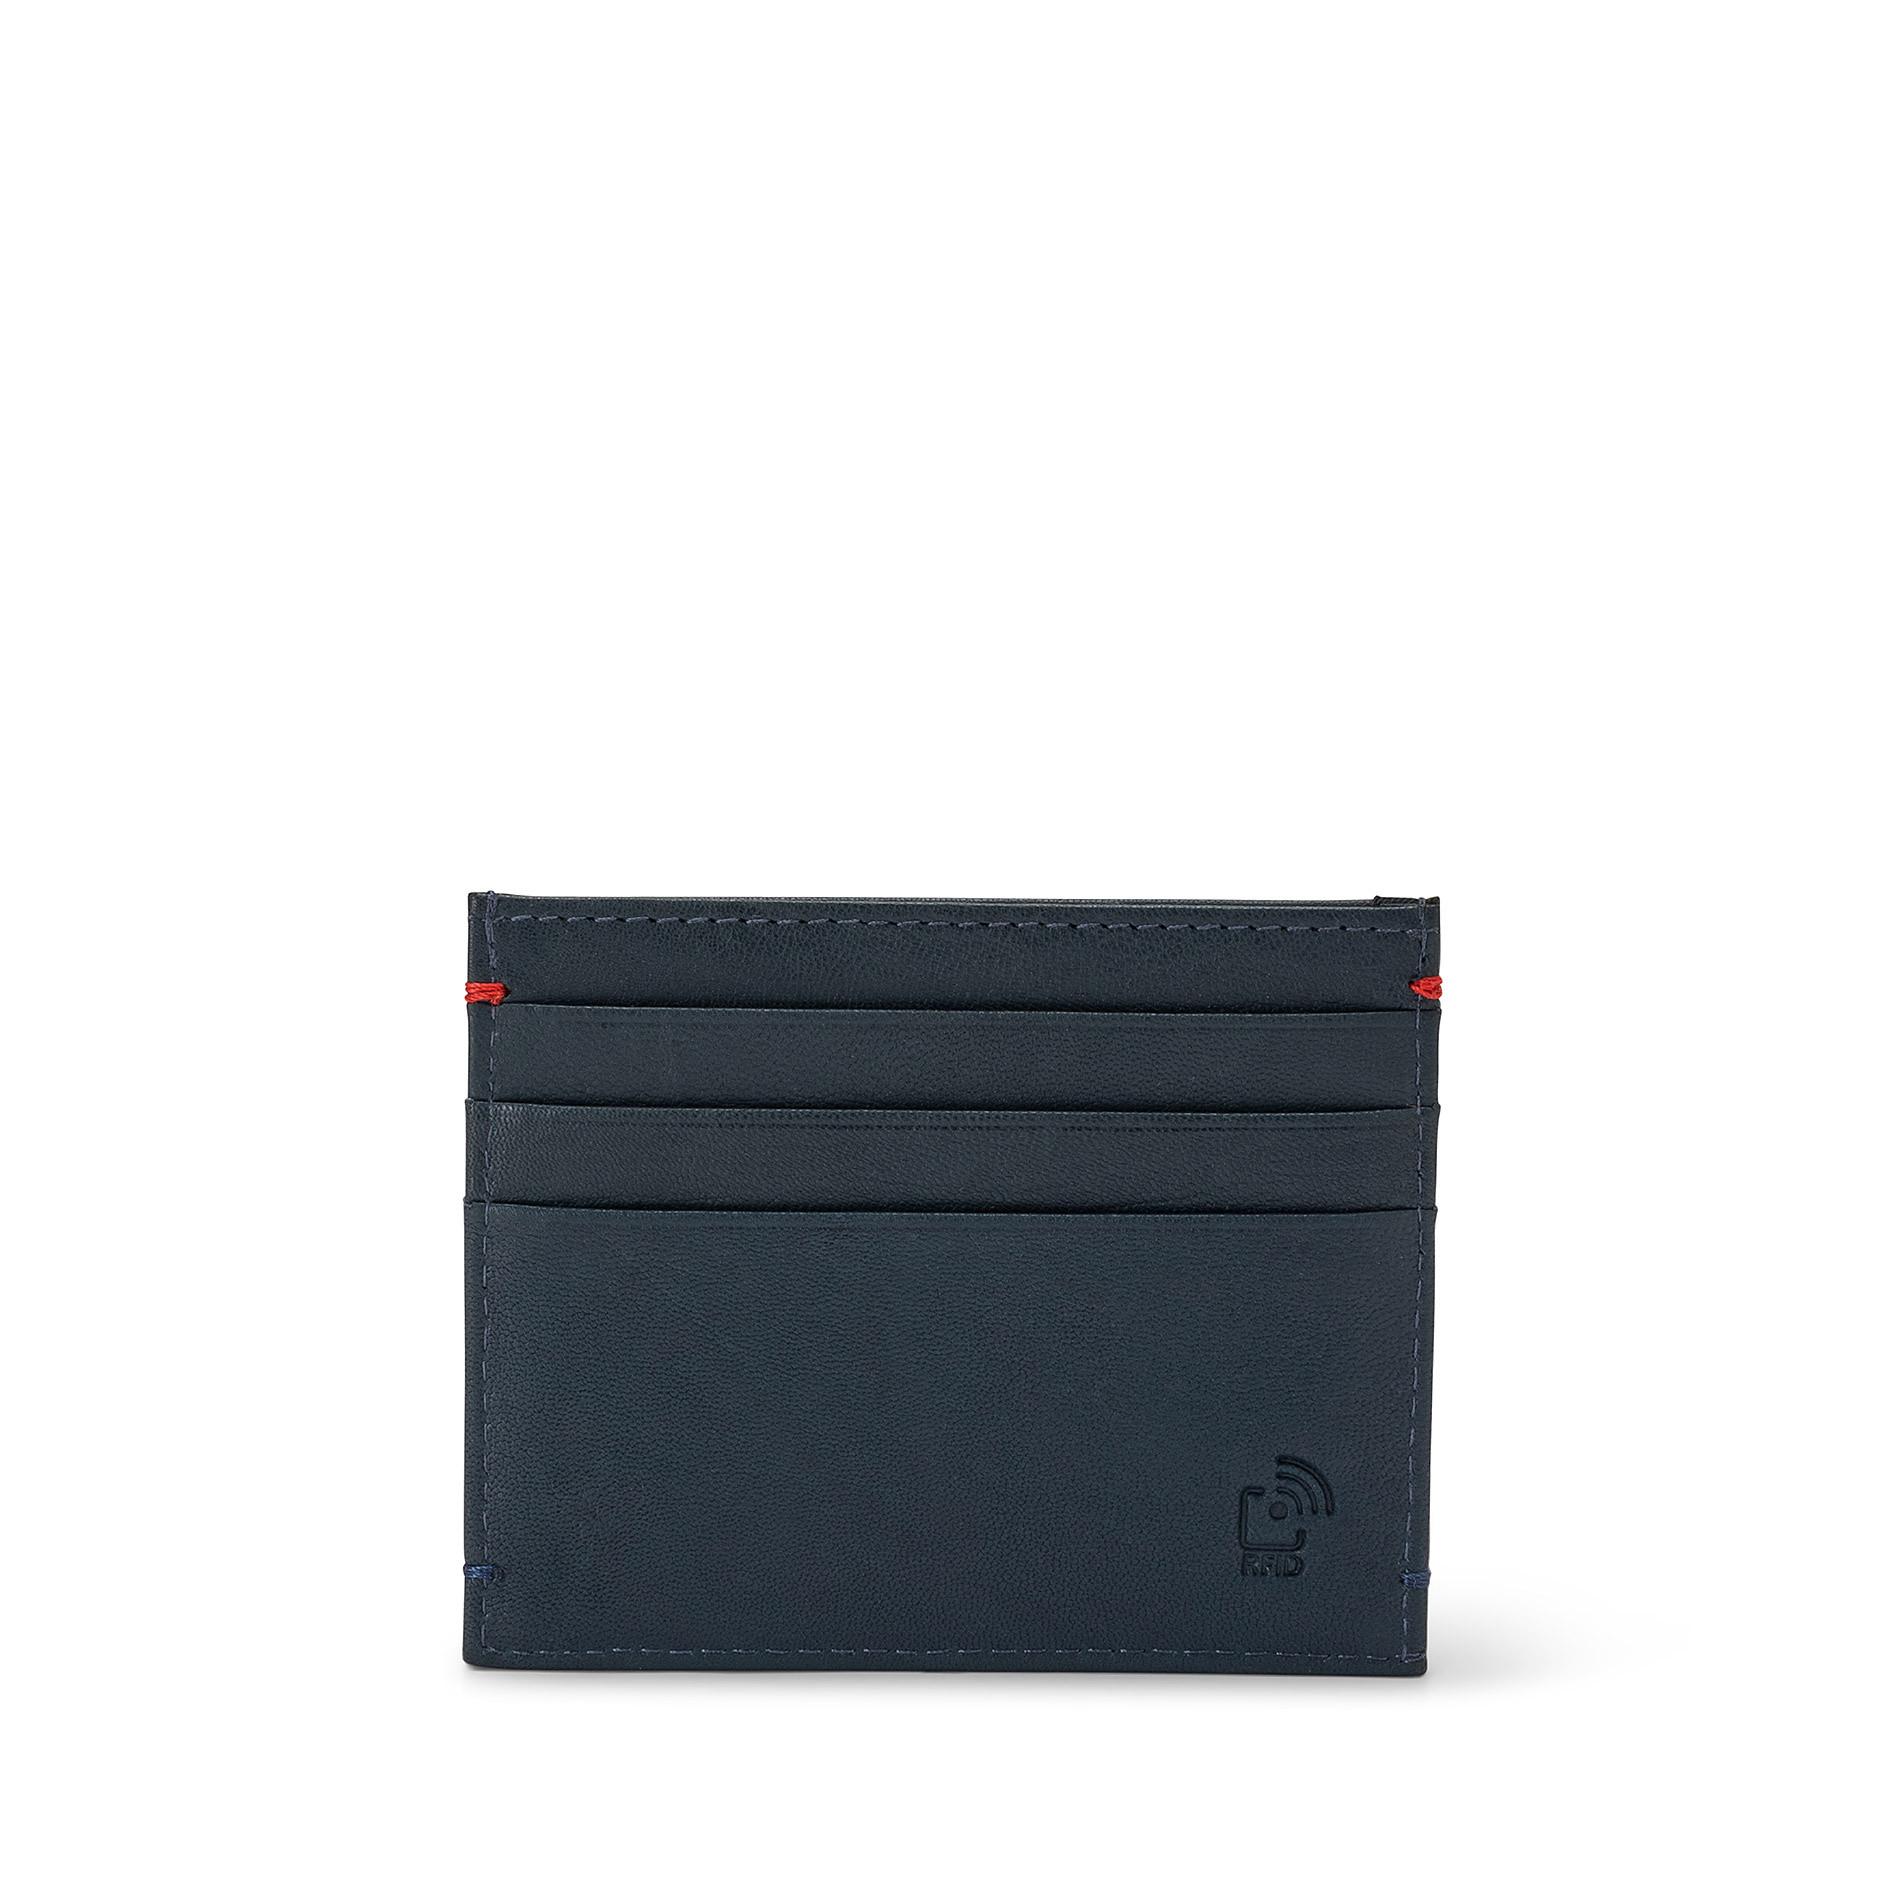 Porta carte di credito in pelle Luca D'Altieri, Blu, large image number 2